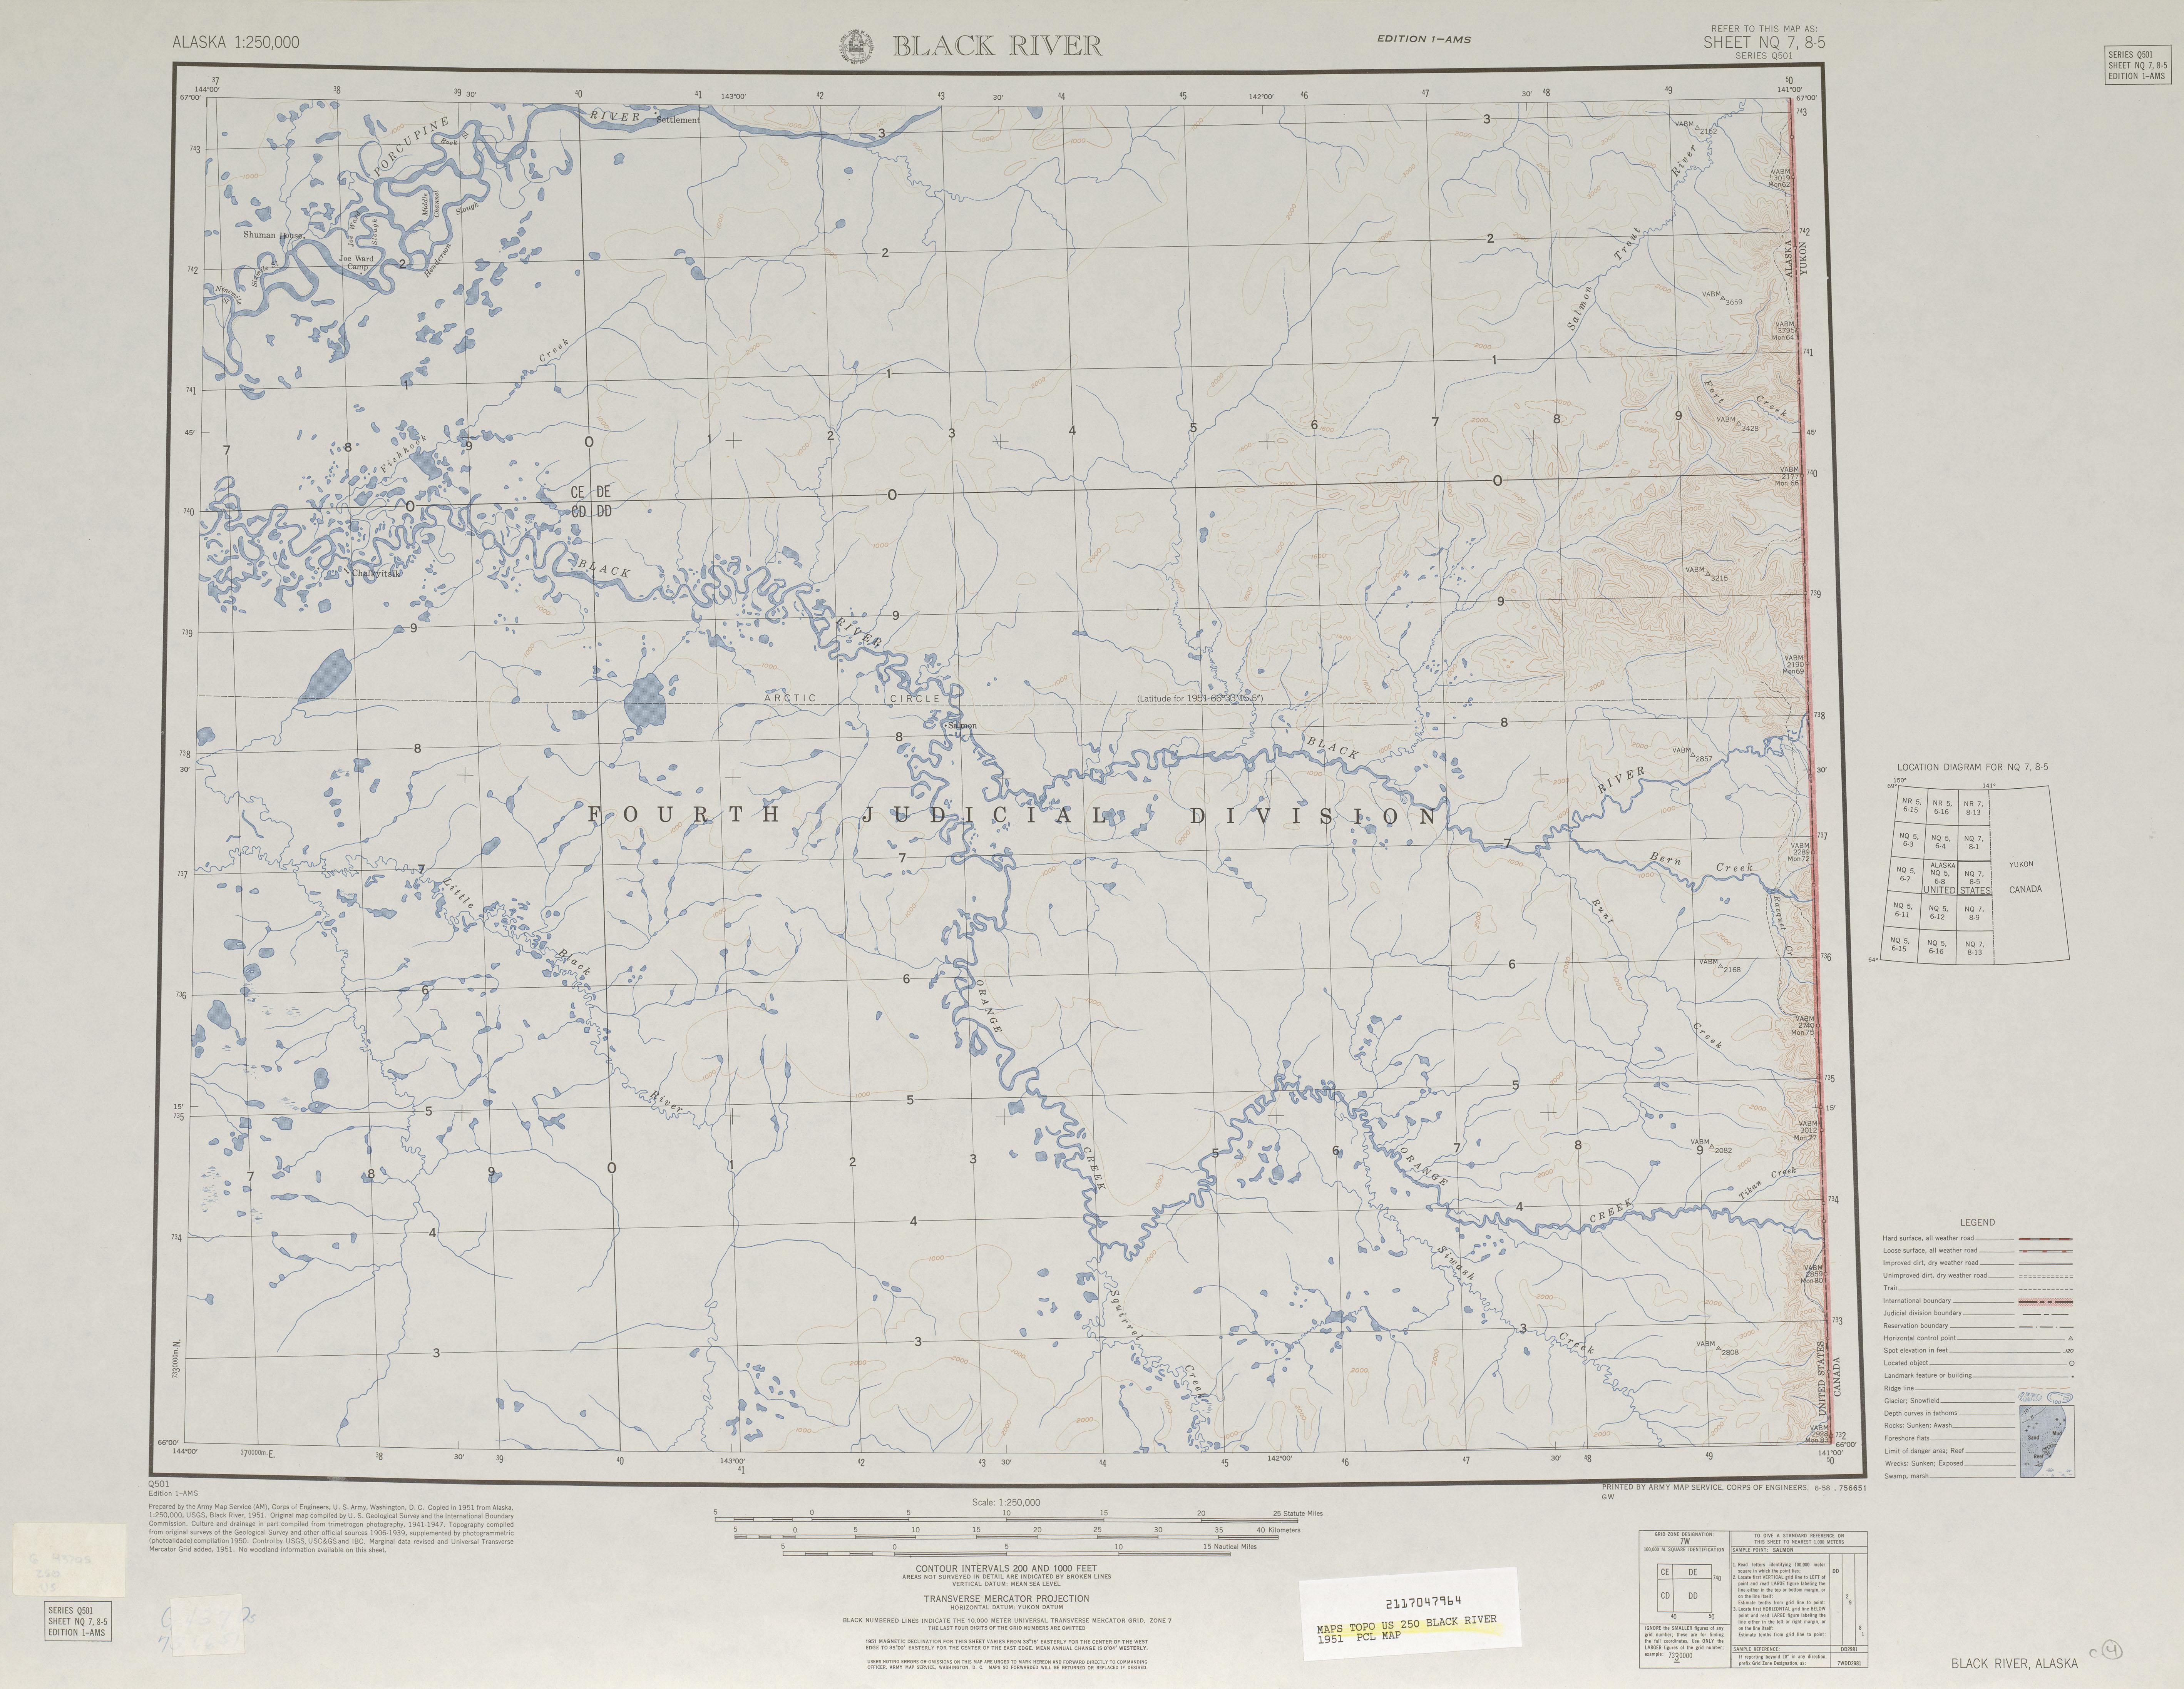 map 25 mb black river 1951